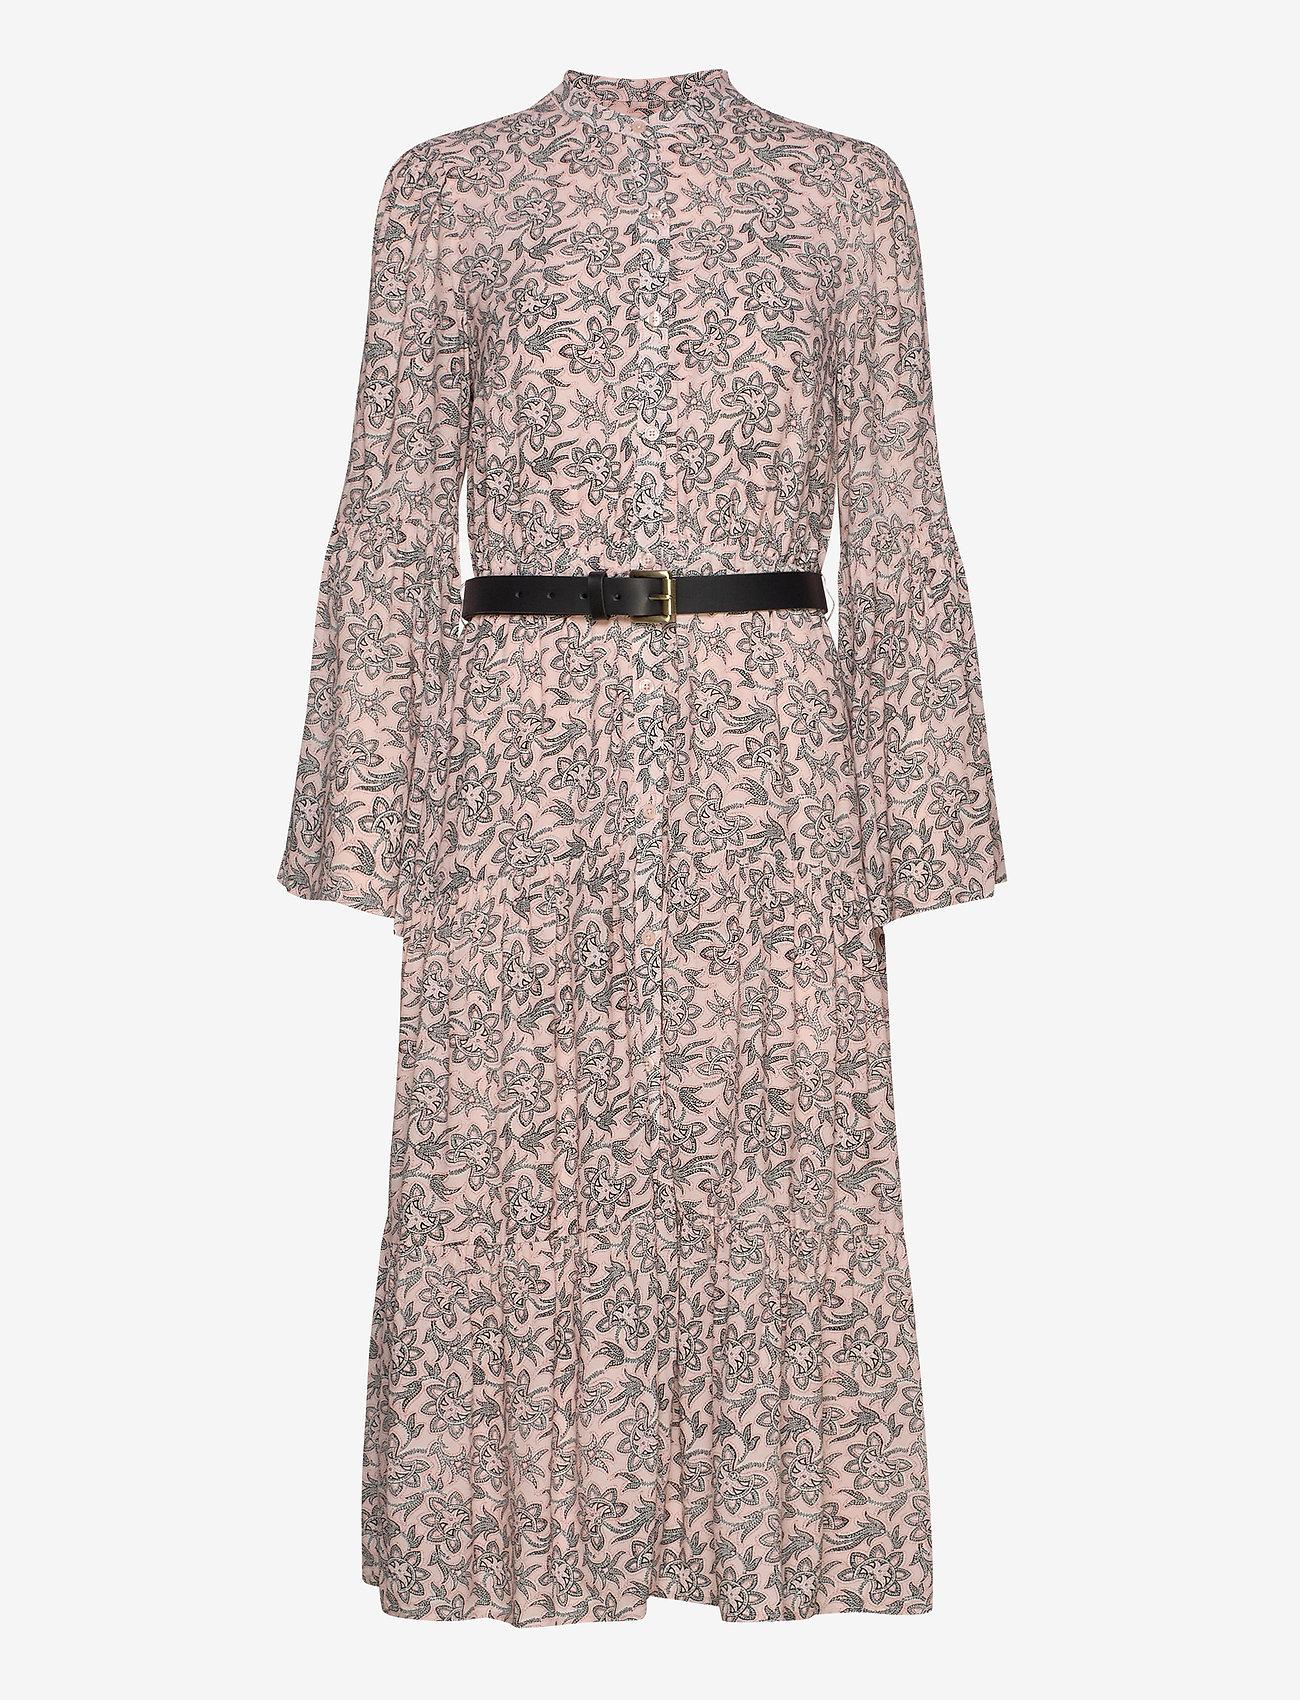 Michael Kors - LEAFY MEDL MIDI DRESS - alledaagse jurken - powder blush - 0